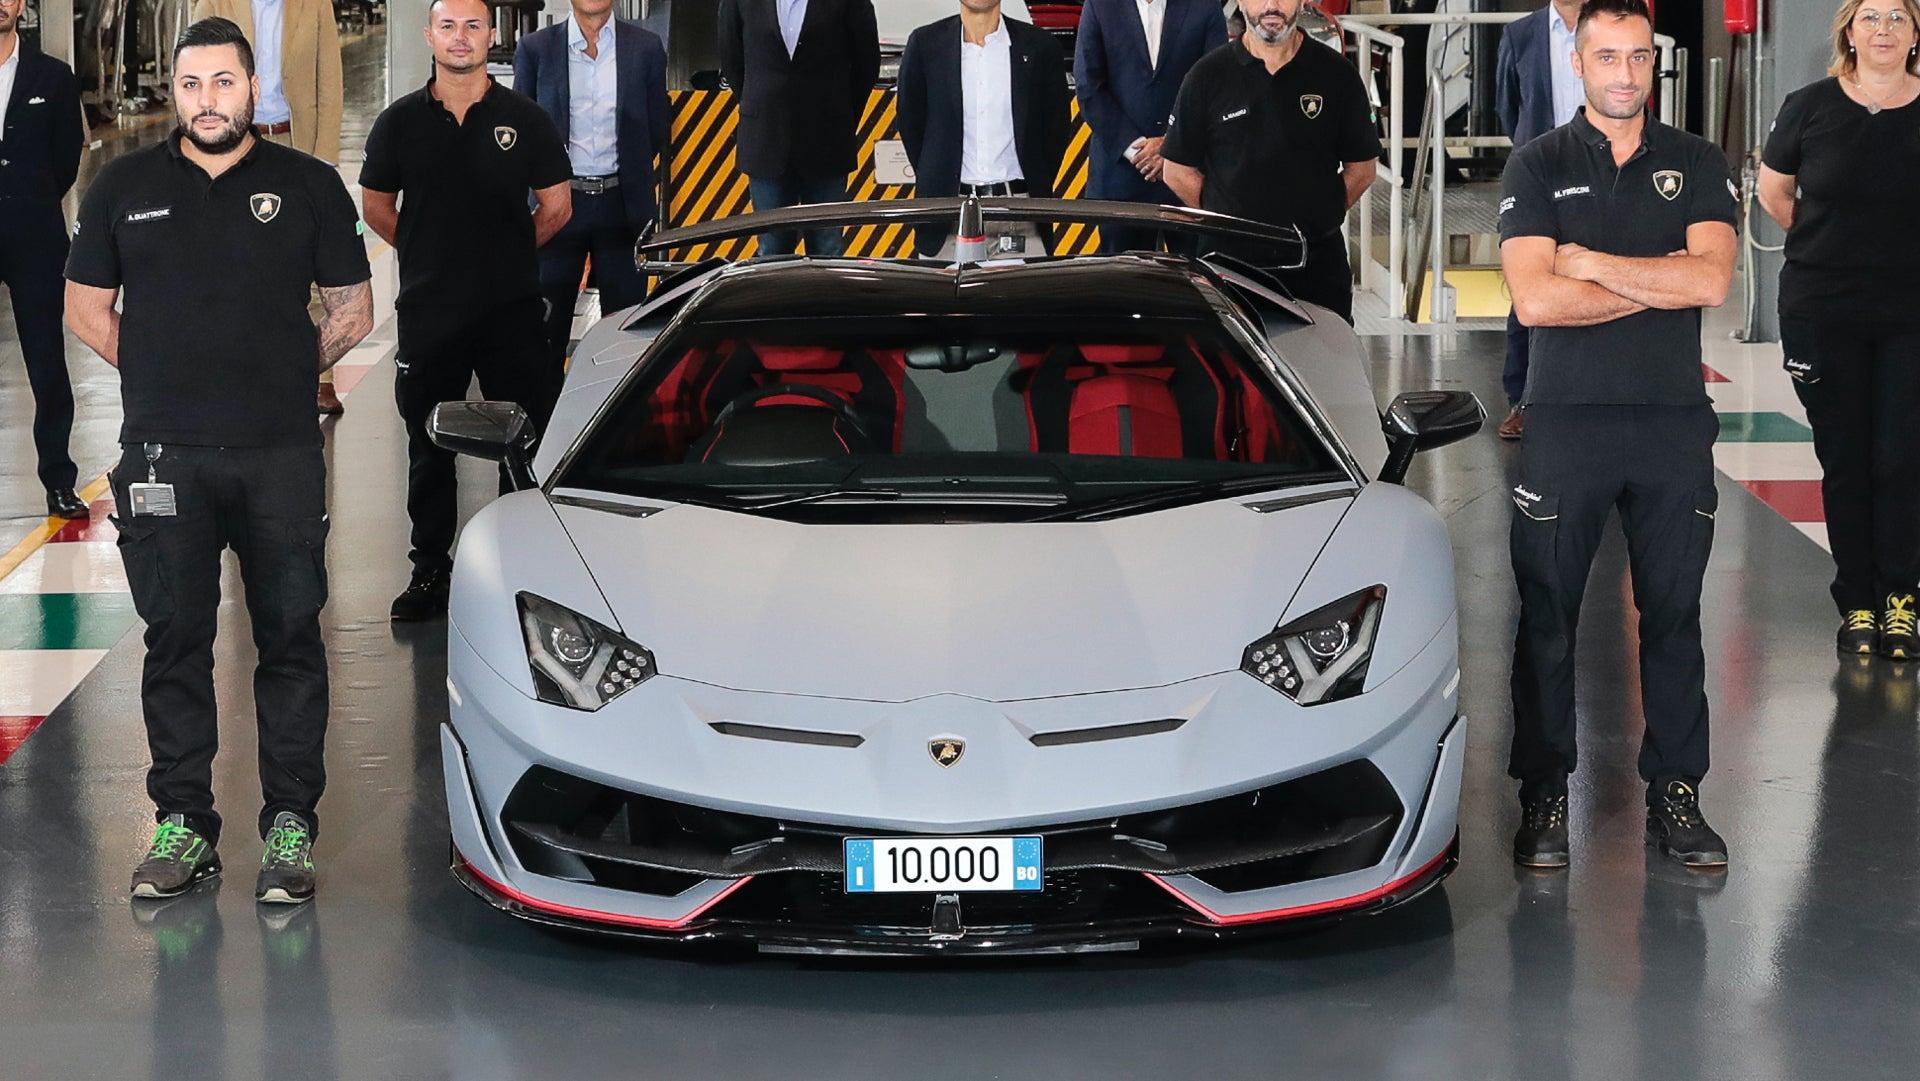 Lamborghini Aventador Capai Angka Produksi 10.000 Unit